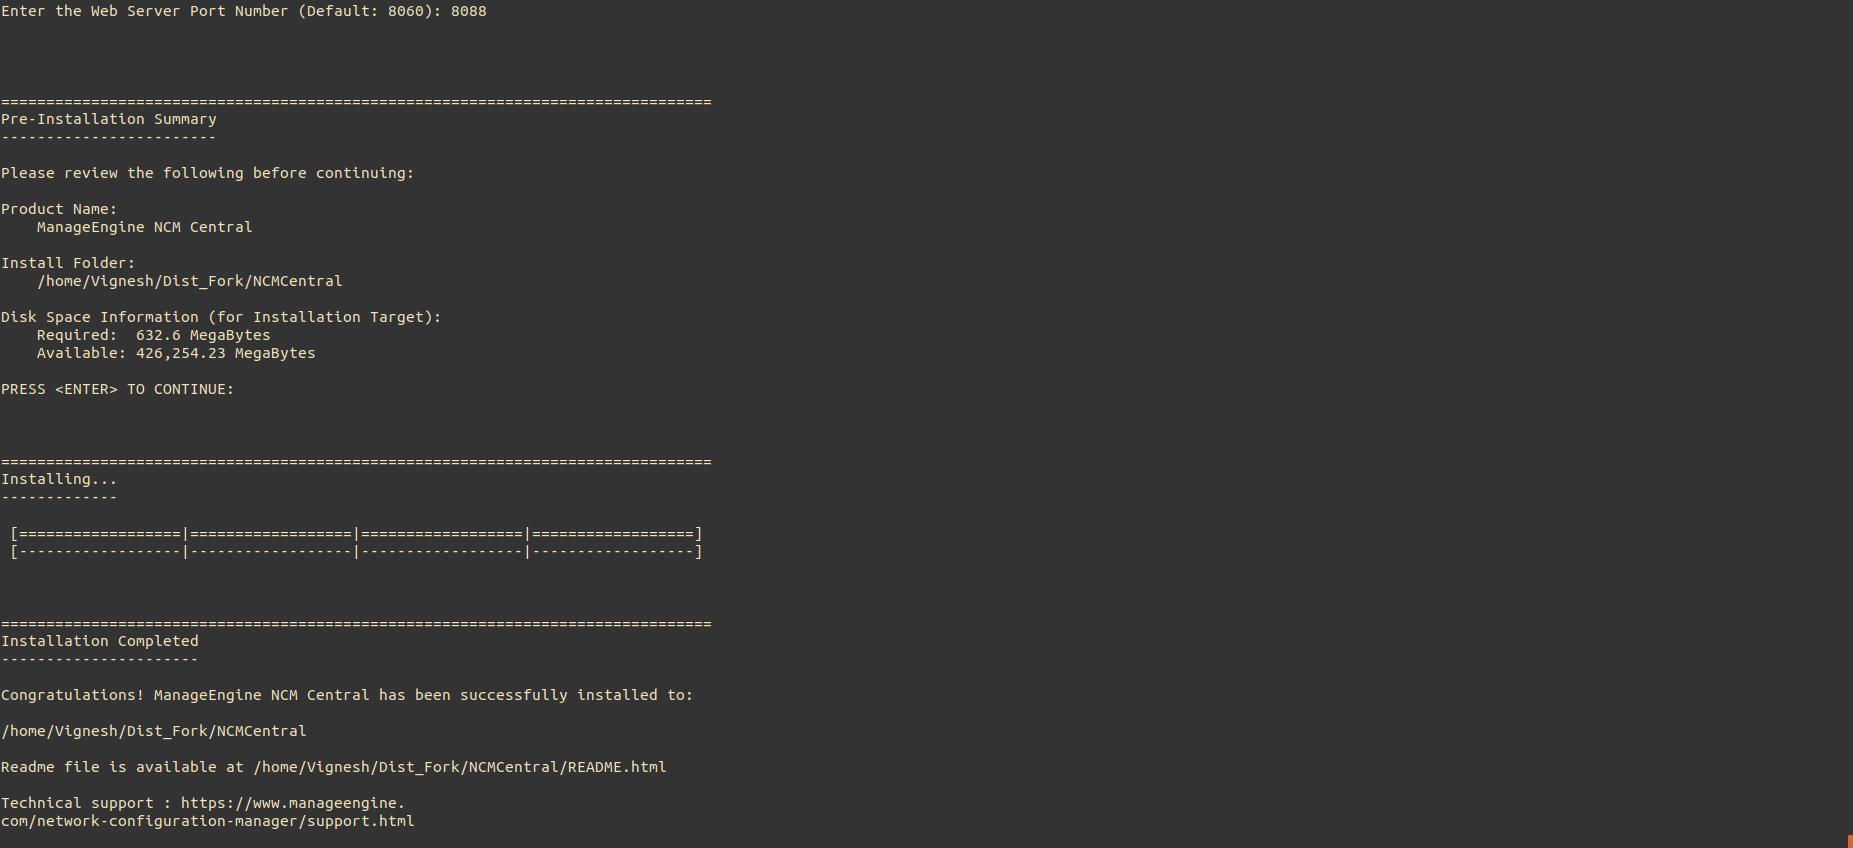 NCM Probe Linux Installation Step6